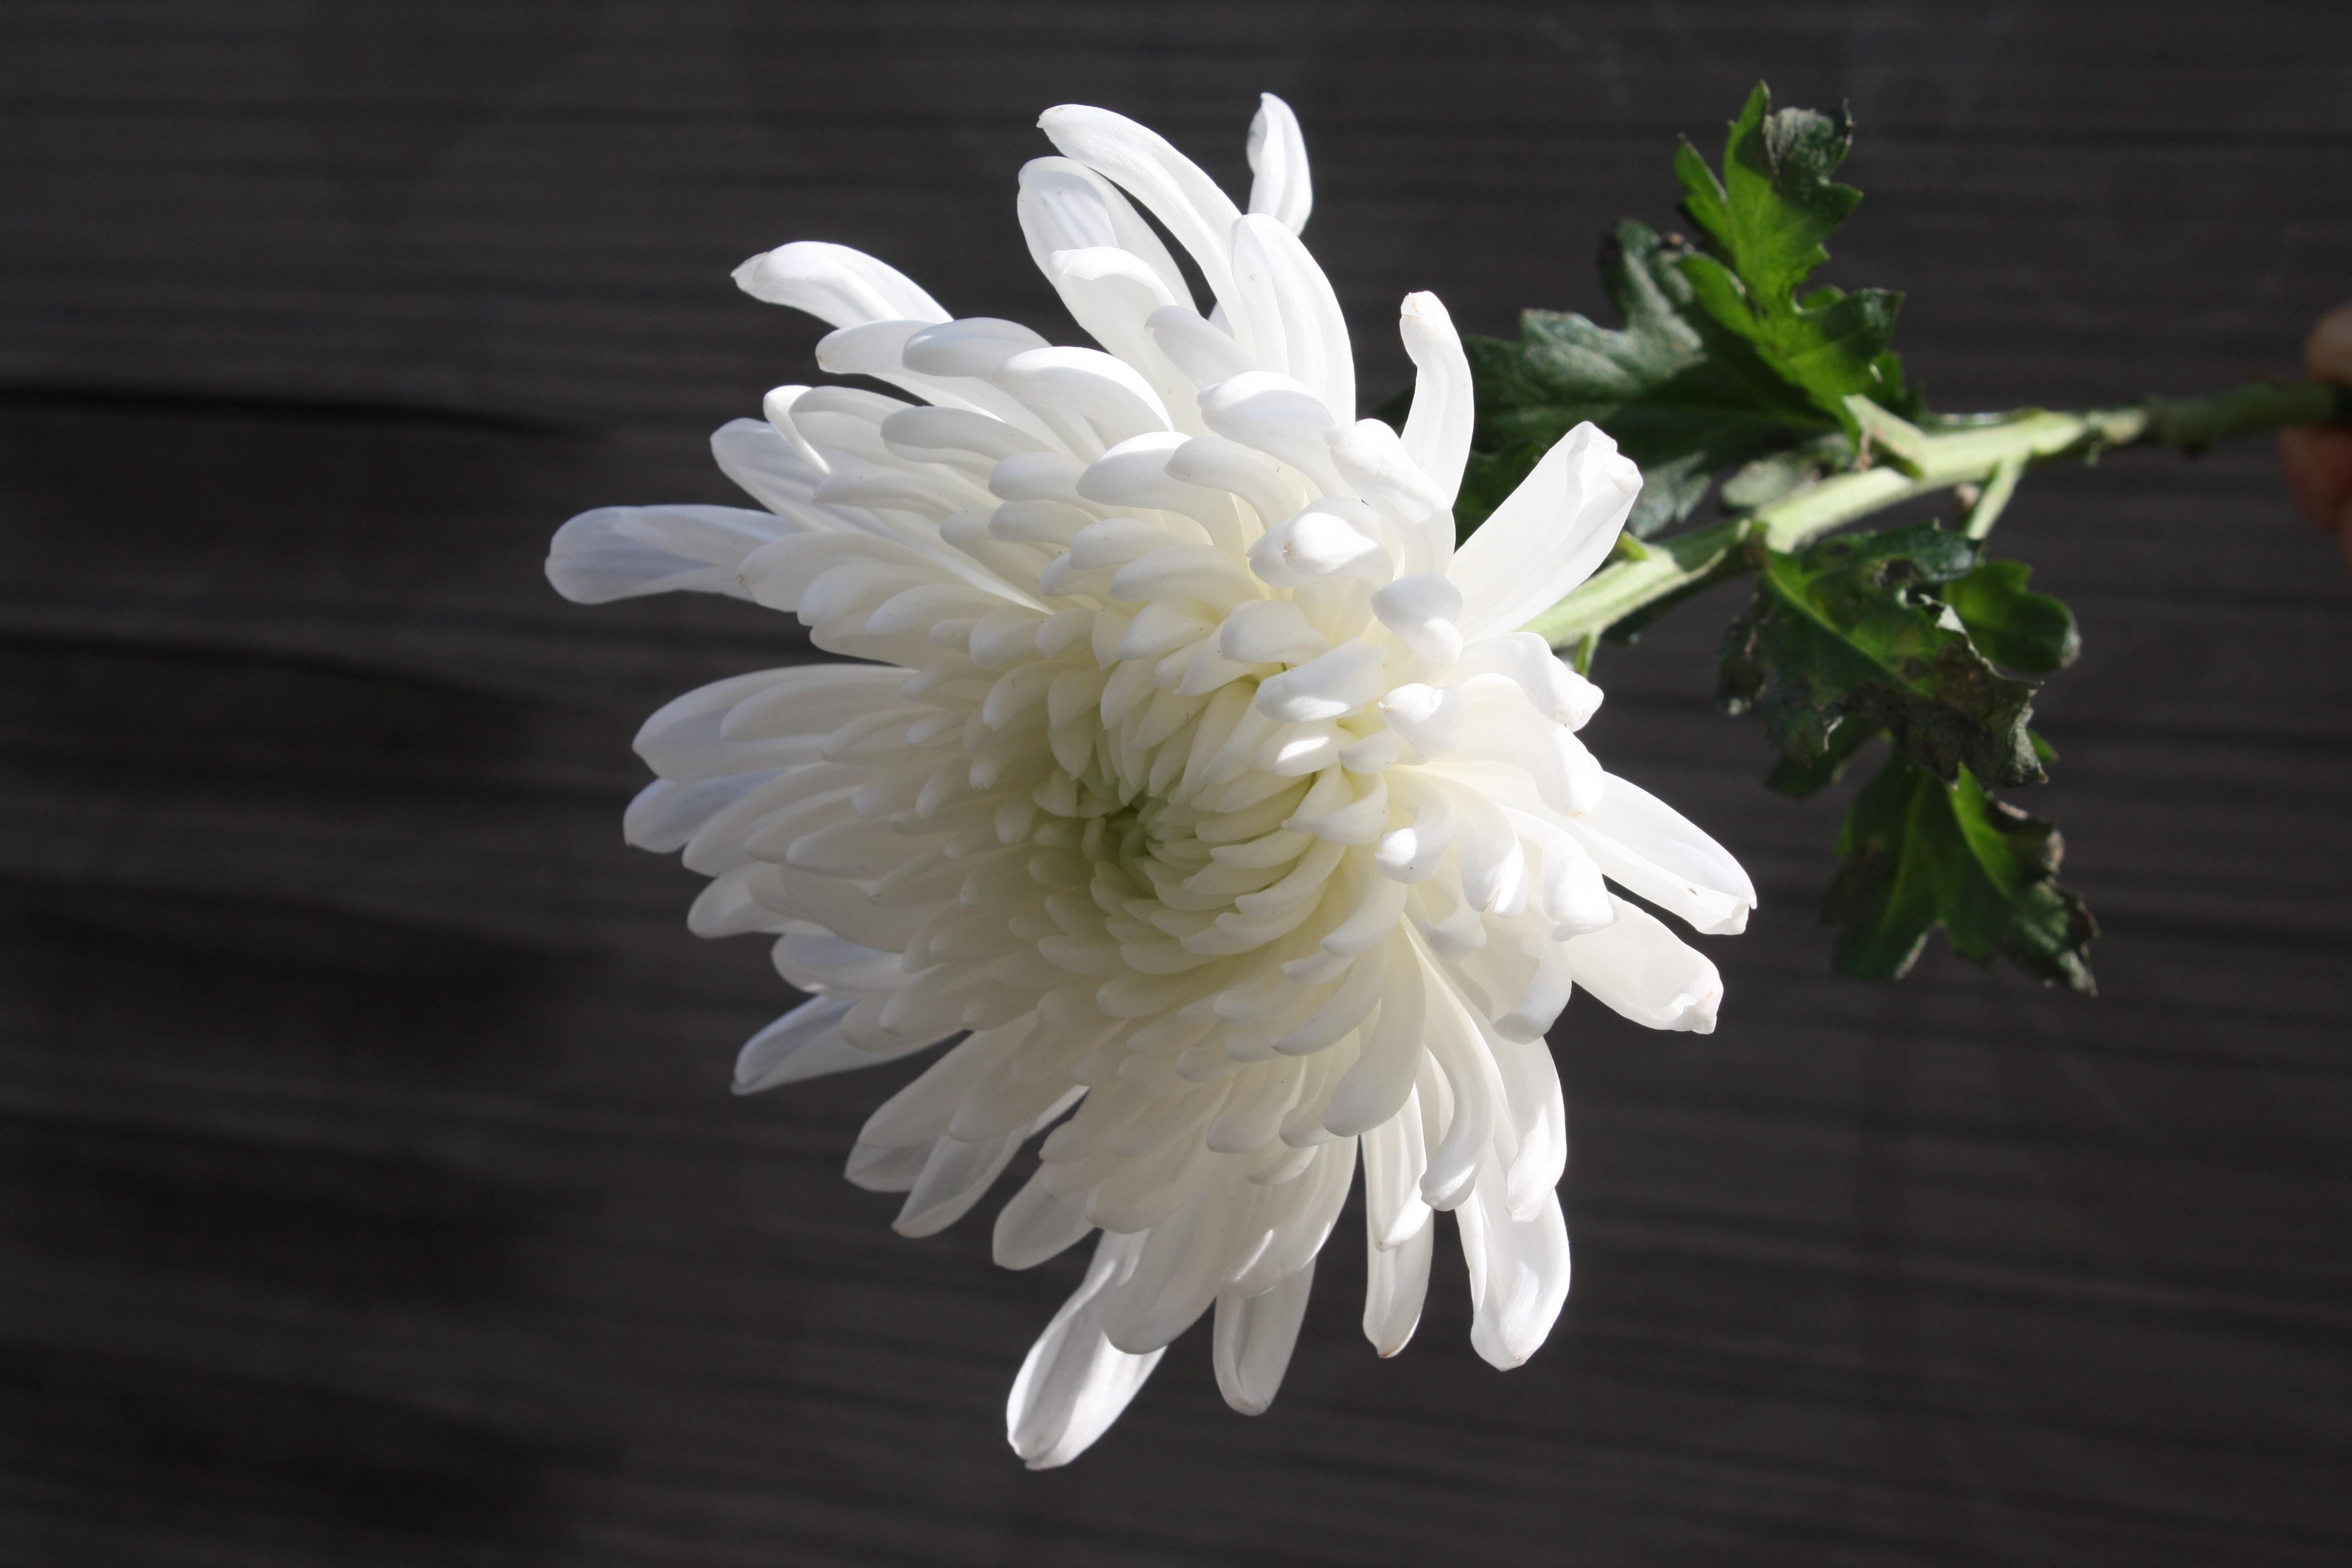 Free images white petal flora chrysanthemum floristry grief plant white flower petal flora chrysanthemum floristry grief mourning flowering plant article daisy family flower bouquet mightylinksfo